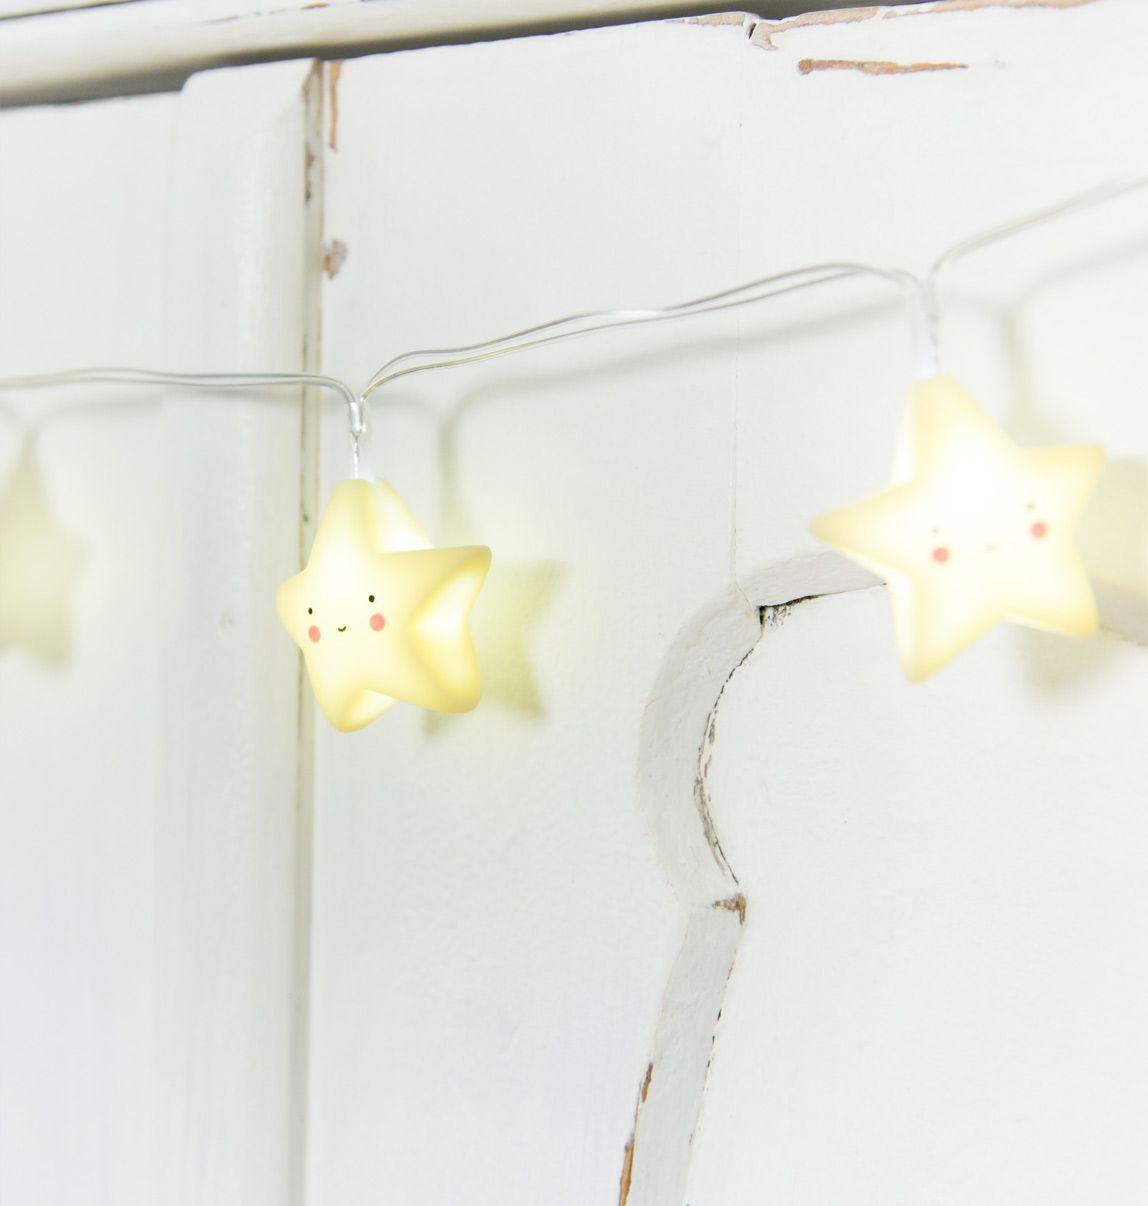 A-little-lovely-company-lyskæde-stjerner-på-skab-closeup